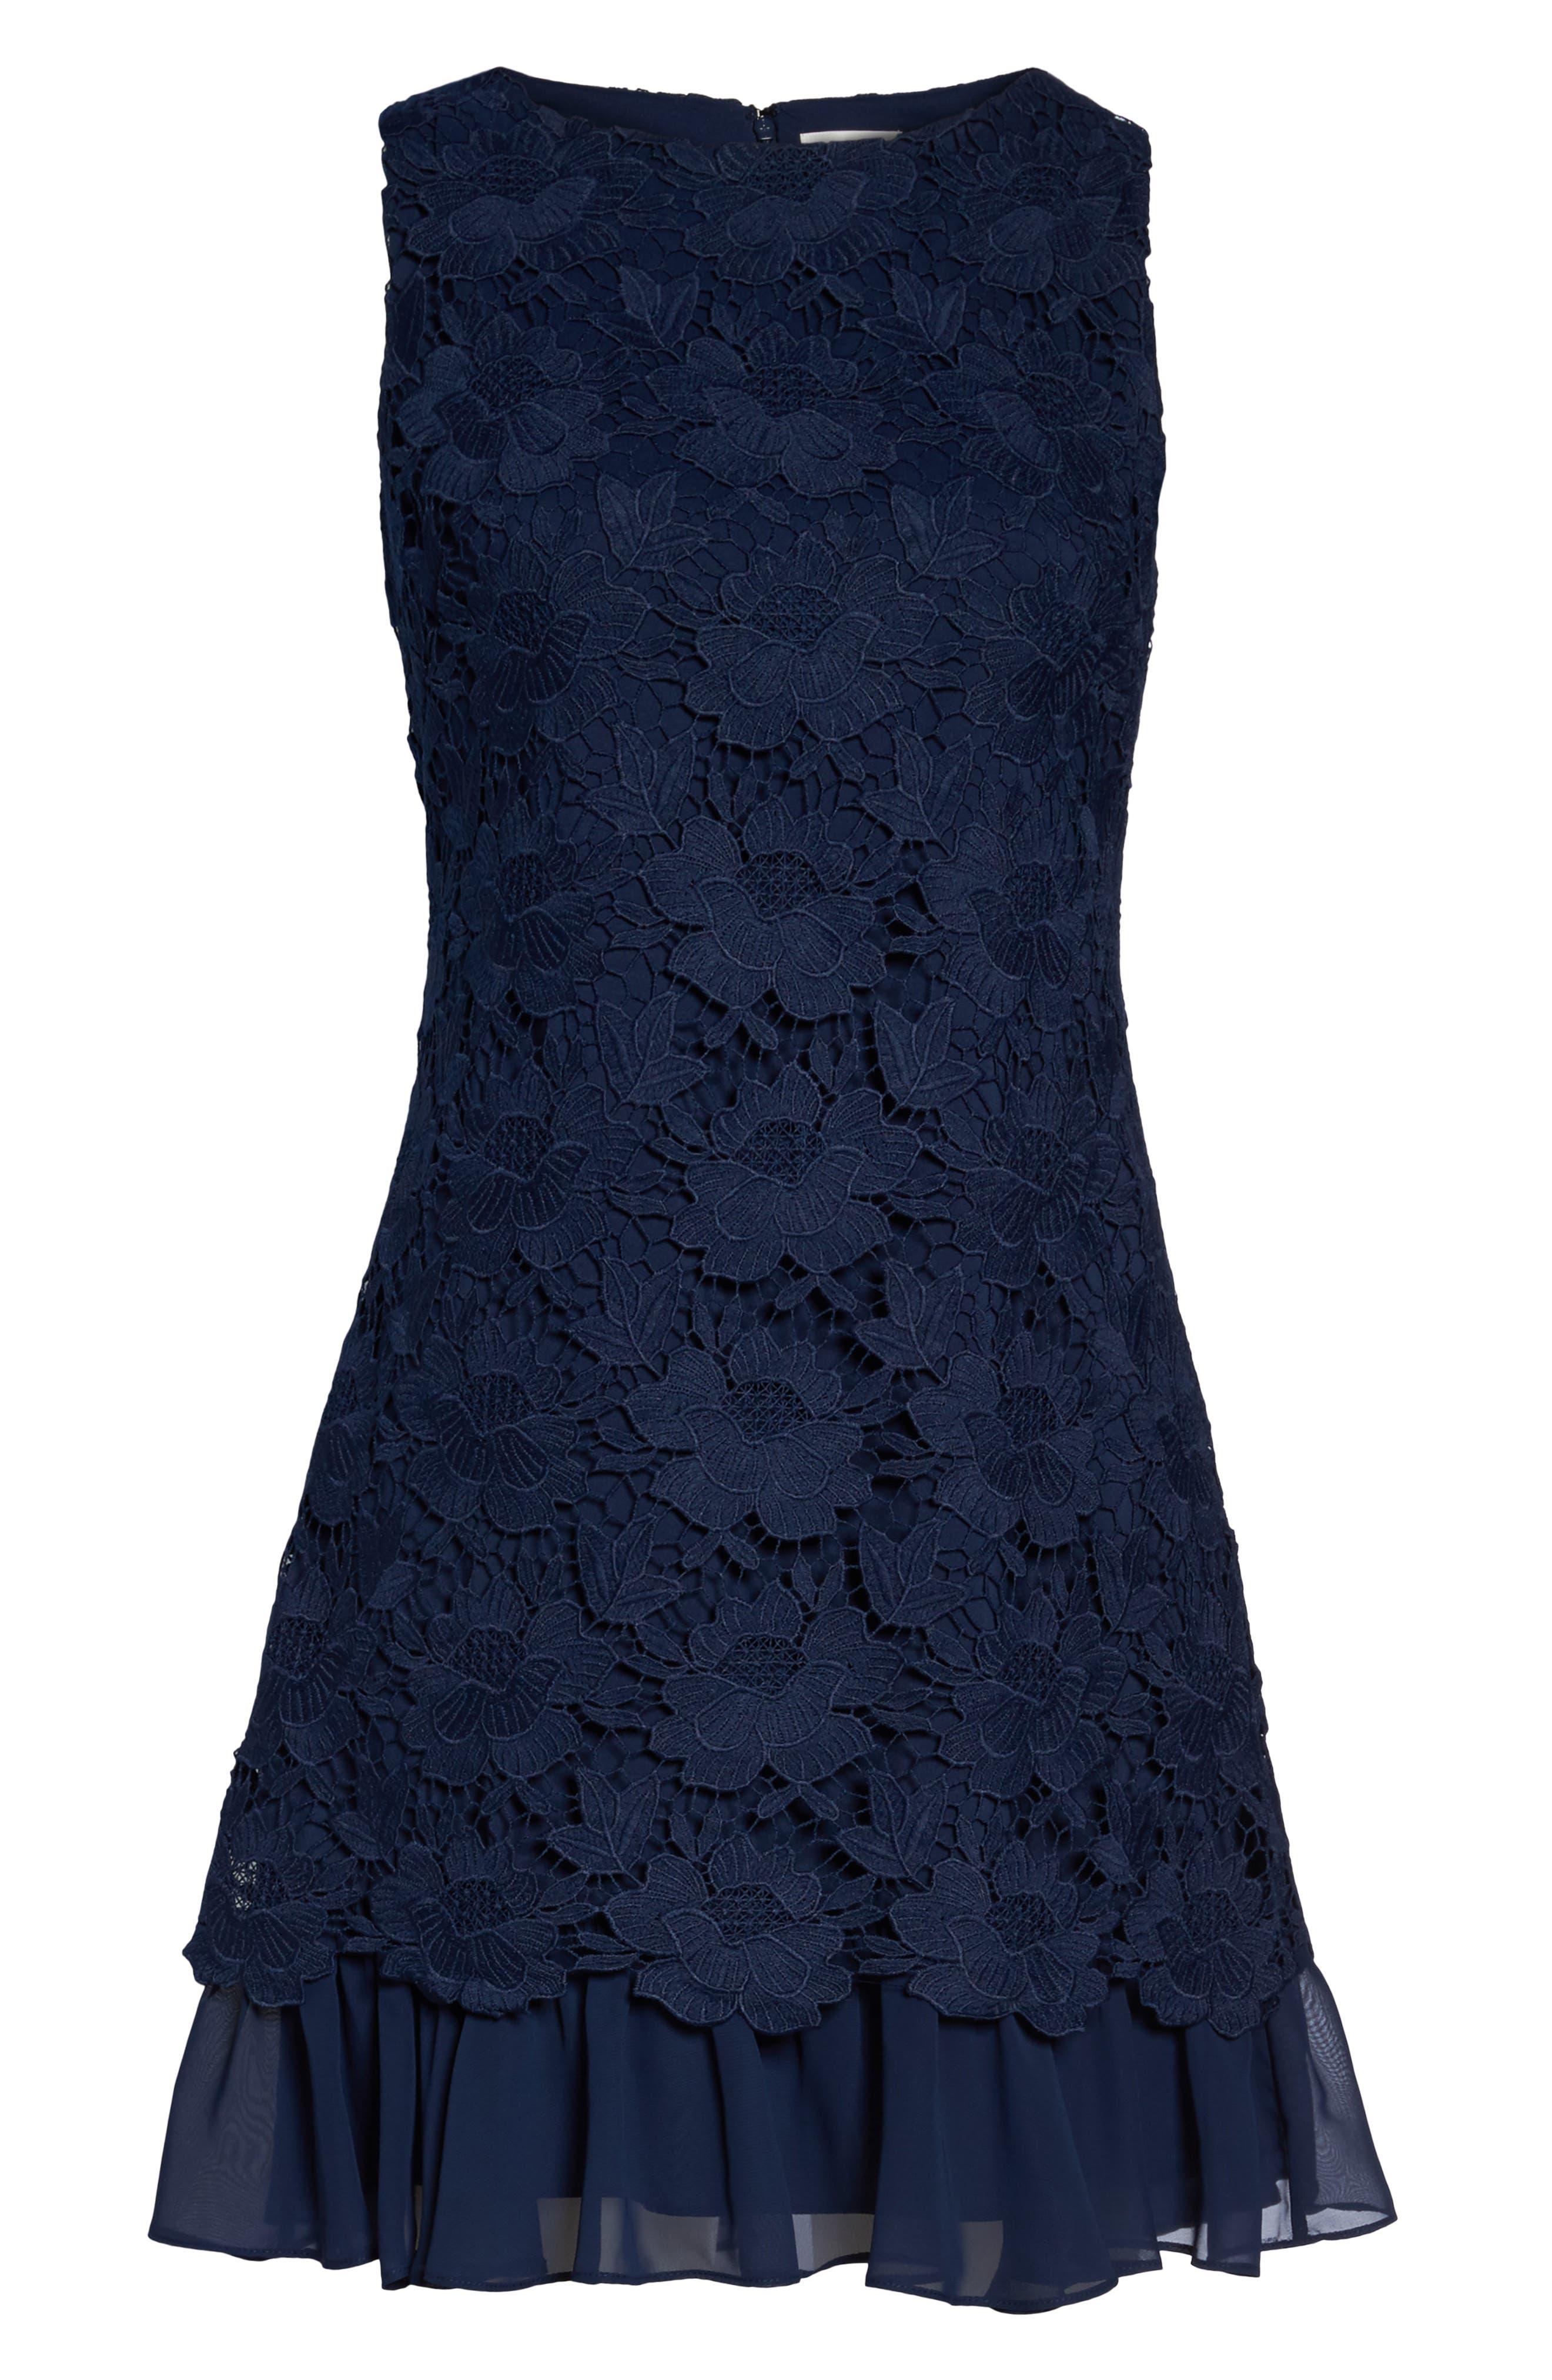 Lace Ruffle Hem Sheath Dress,                             Alternate thumbnail 6, color,                             Navy